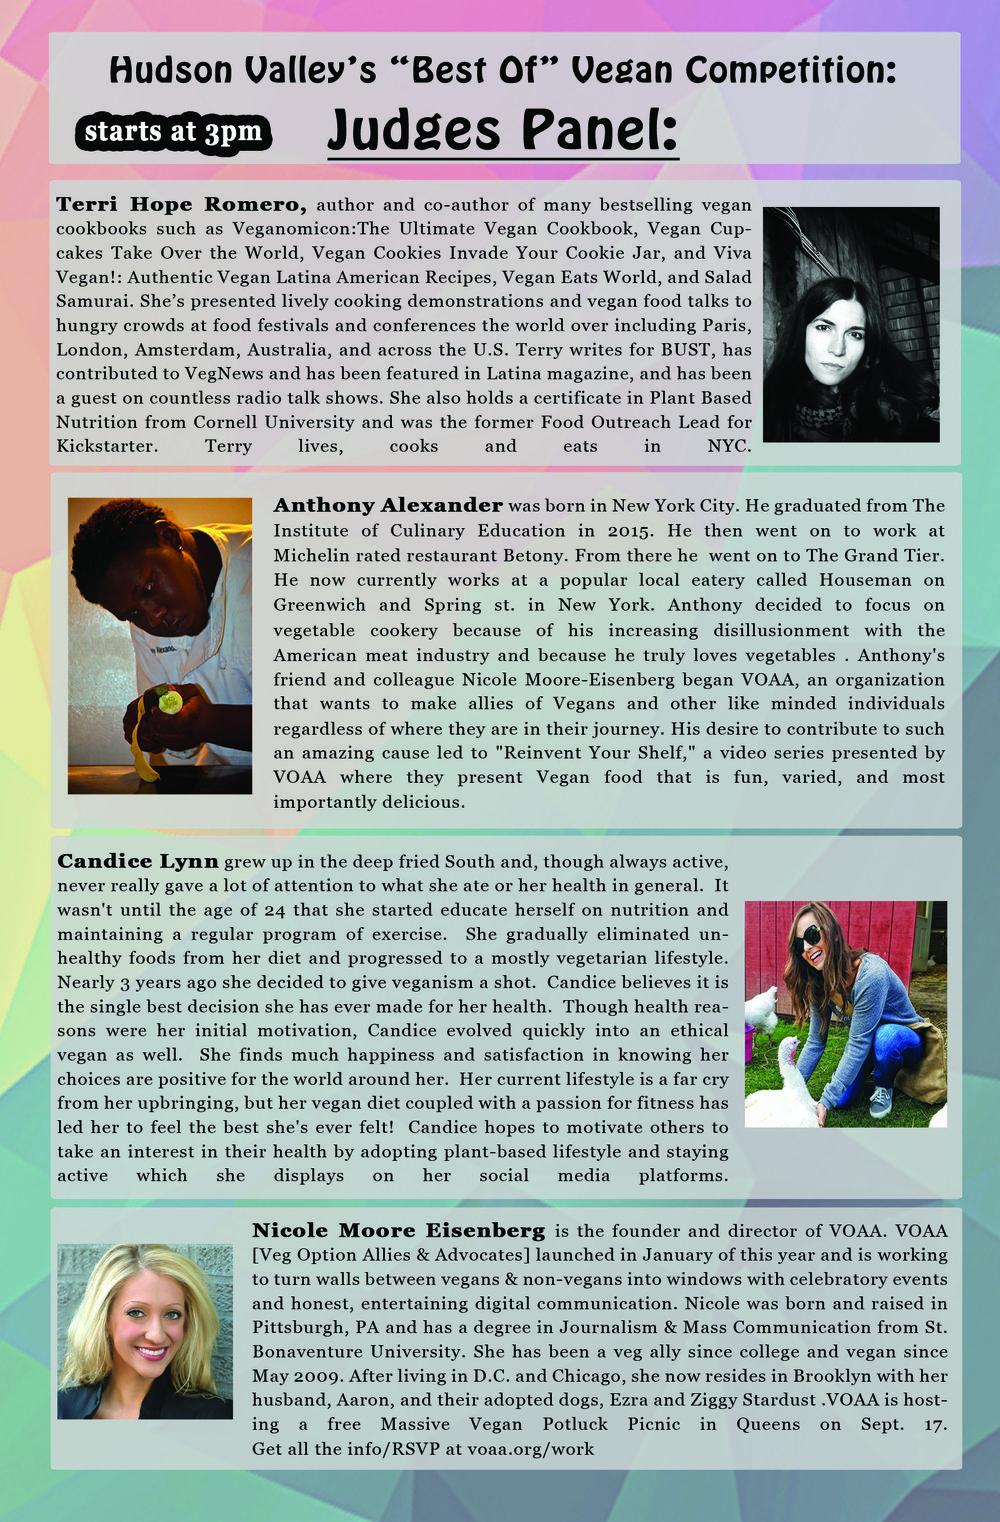 Page 16 - HVVegan Fest Program.jpg